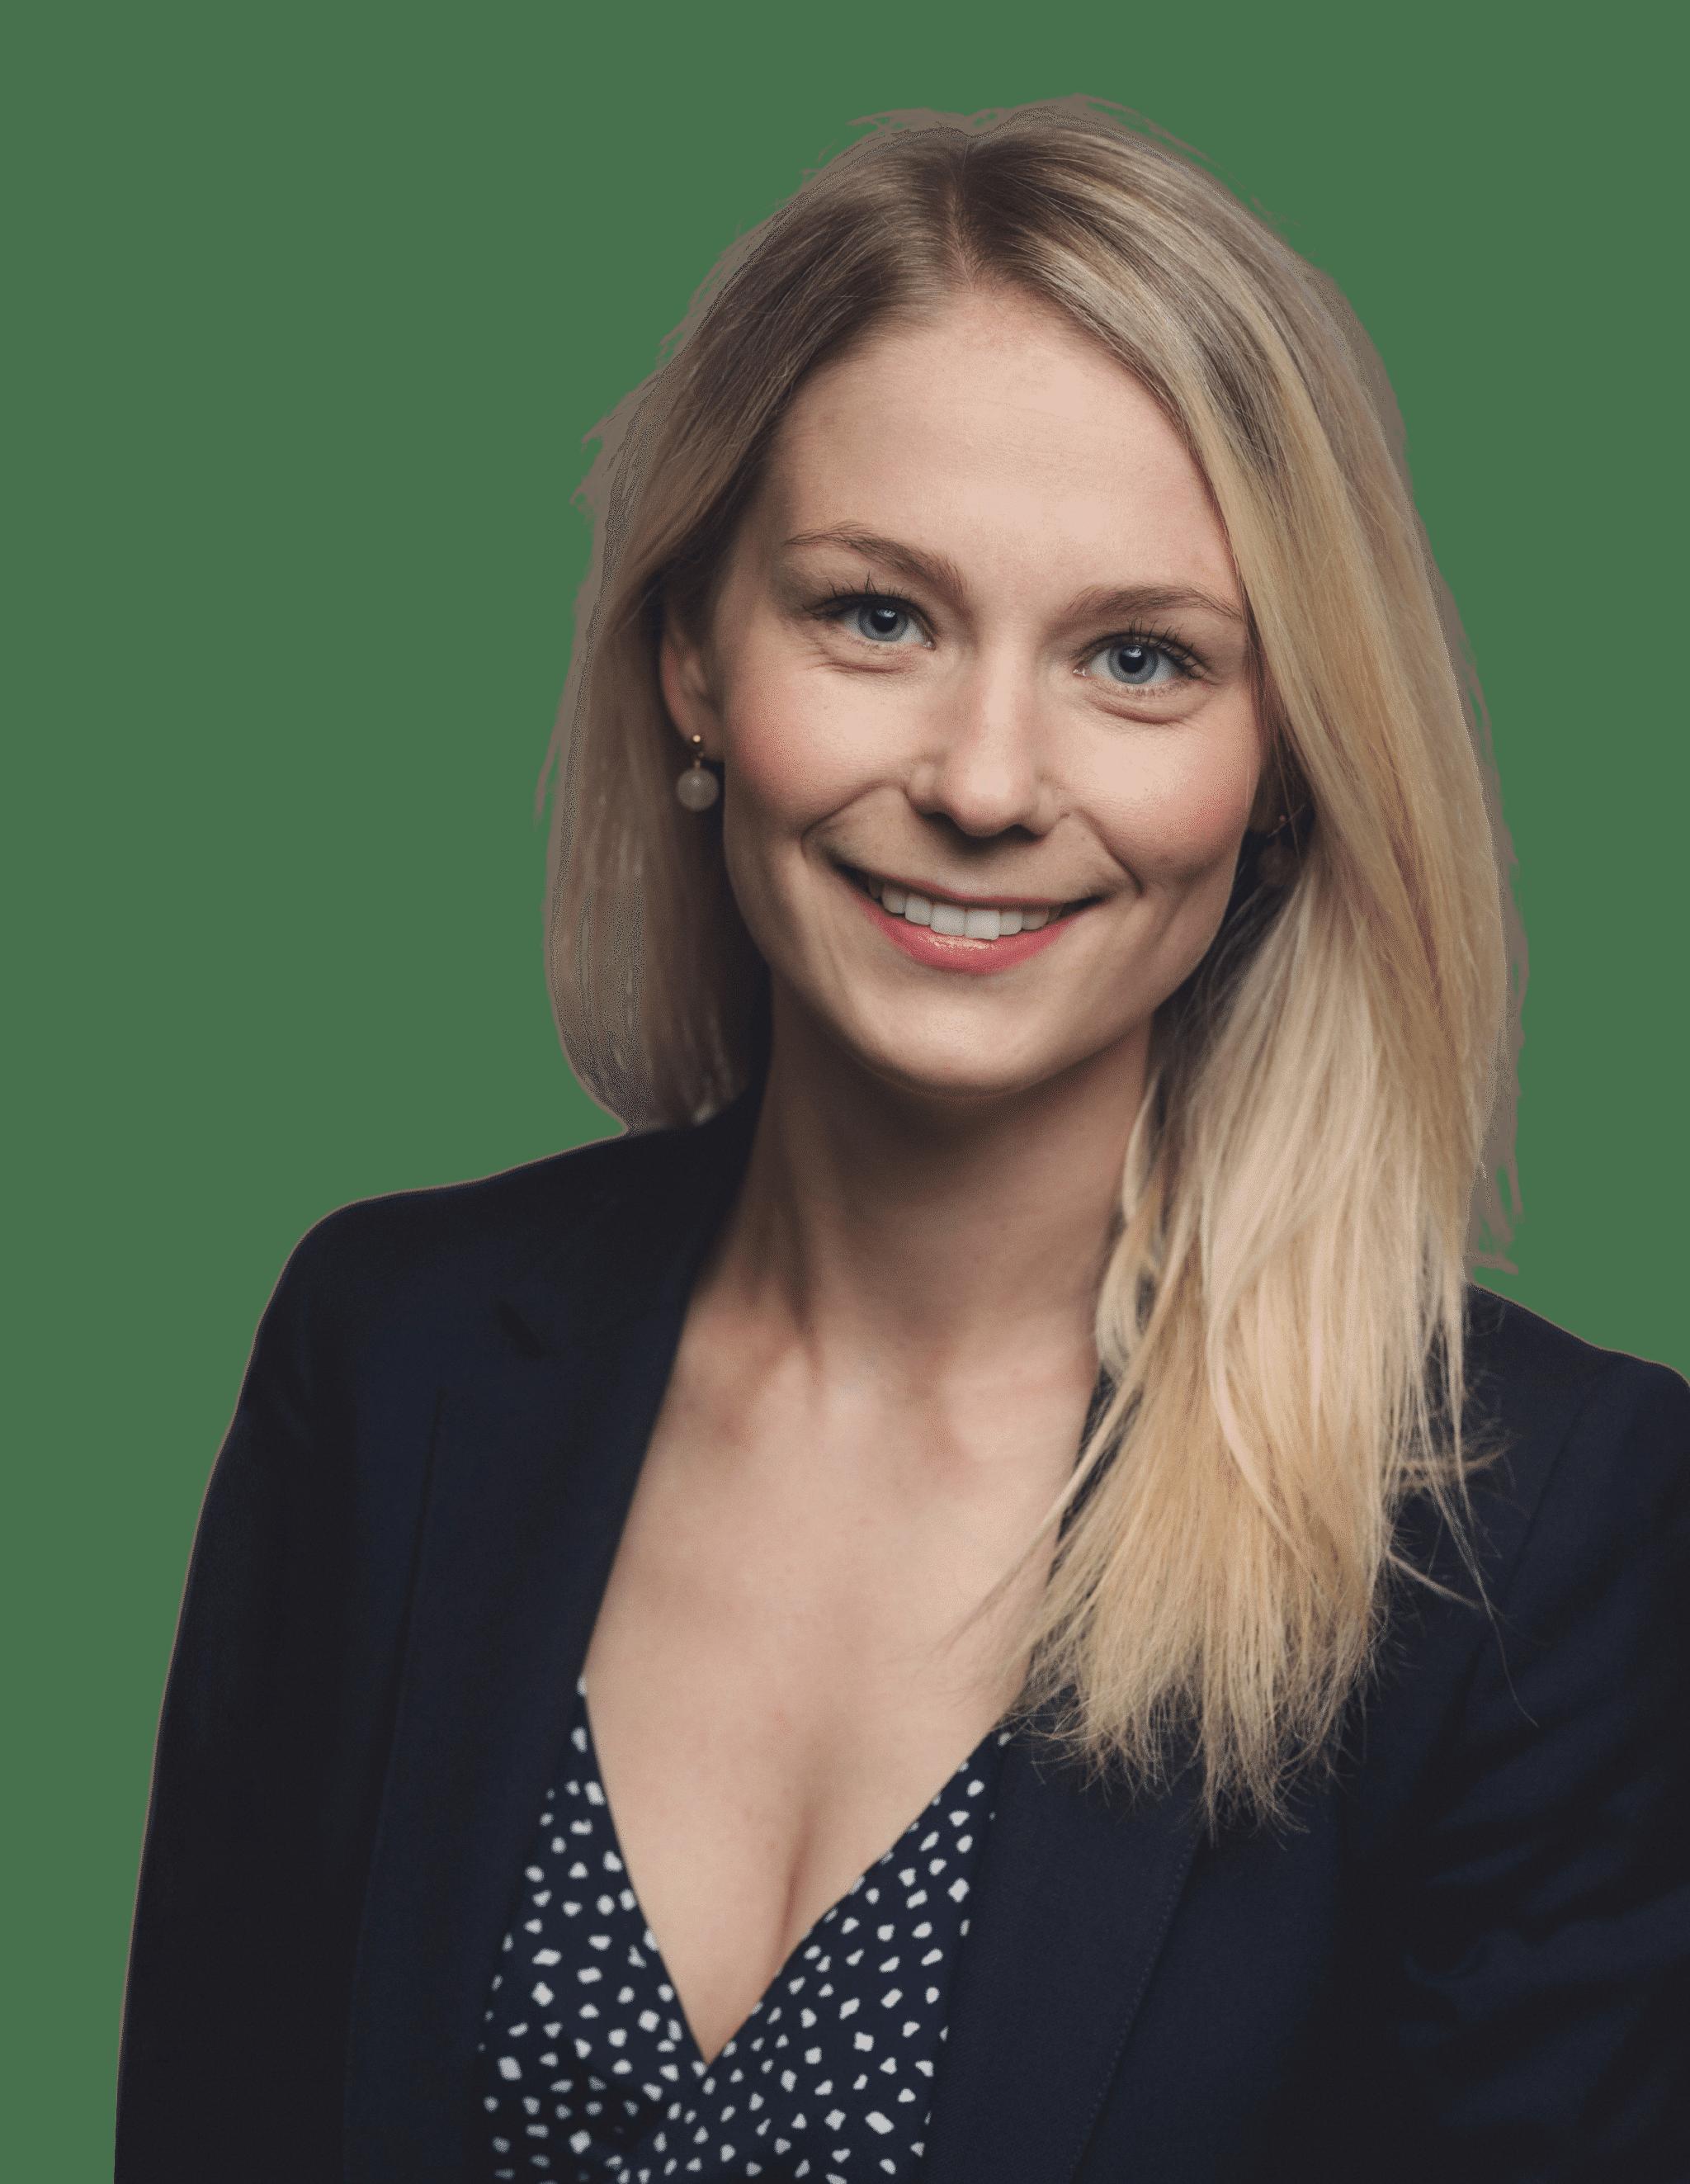 Eva-Maria Merjel Thorgate